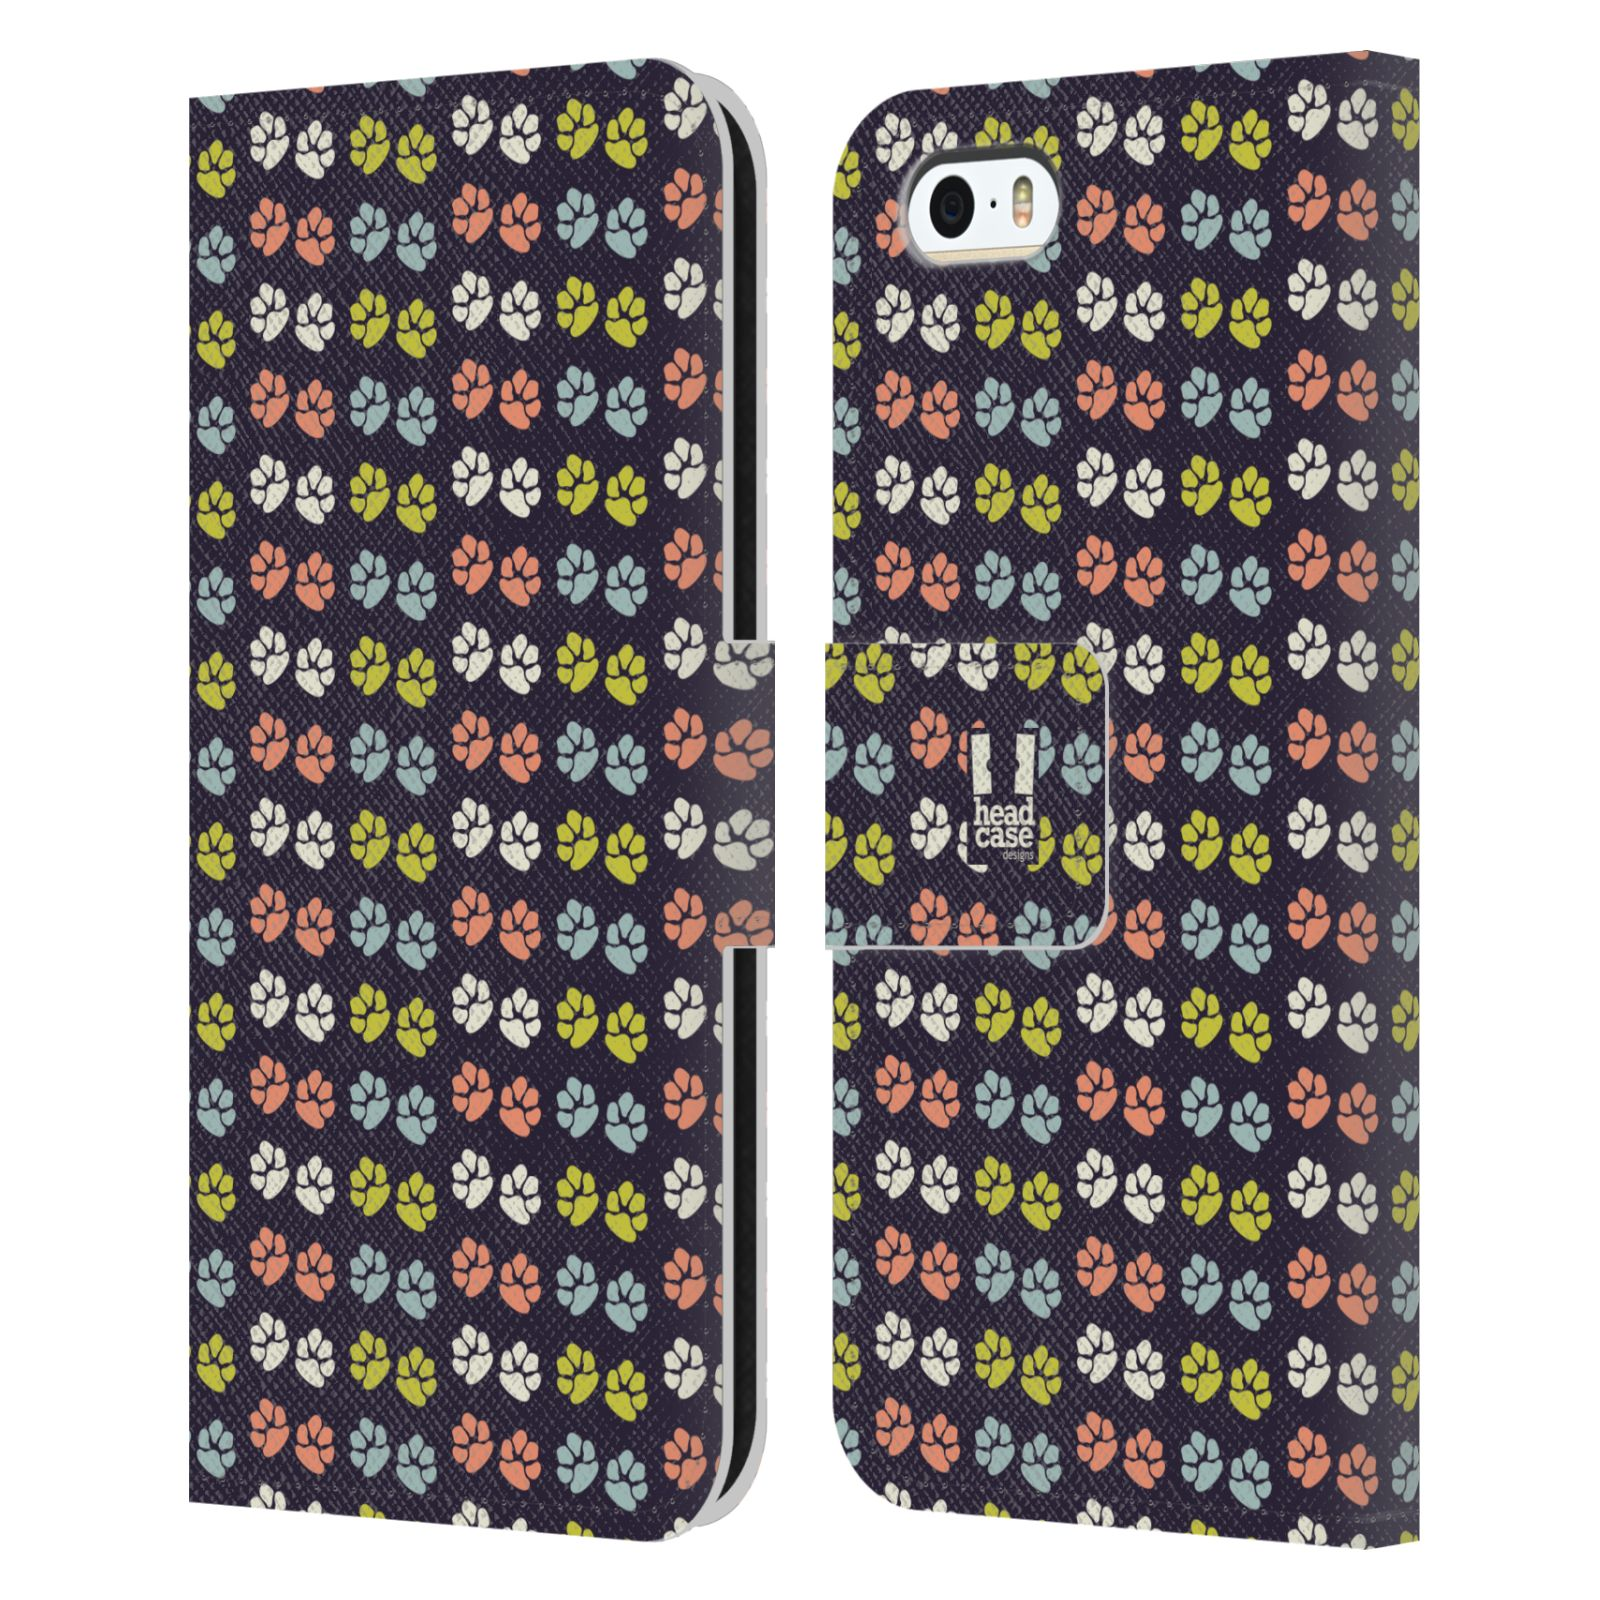 HEAD CASE Flipové pouzdro pro mobil Apple Iphone 5/5s Pejsek ťapky barevné RETRO